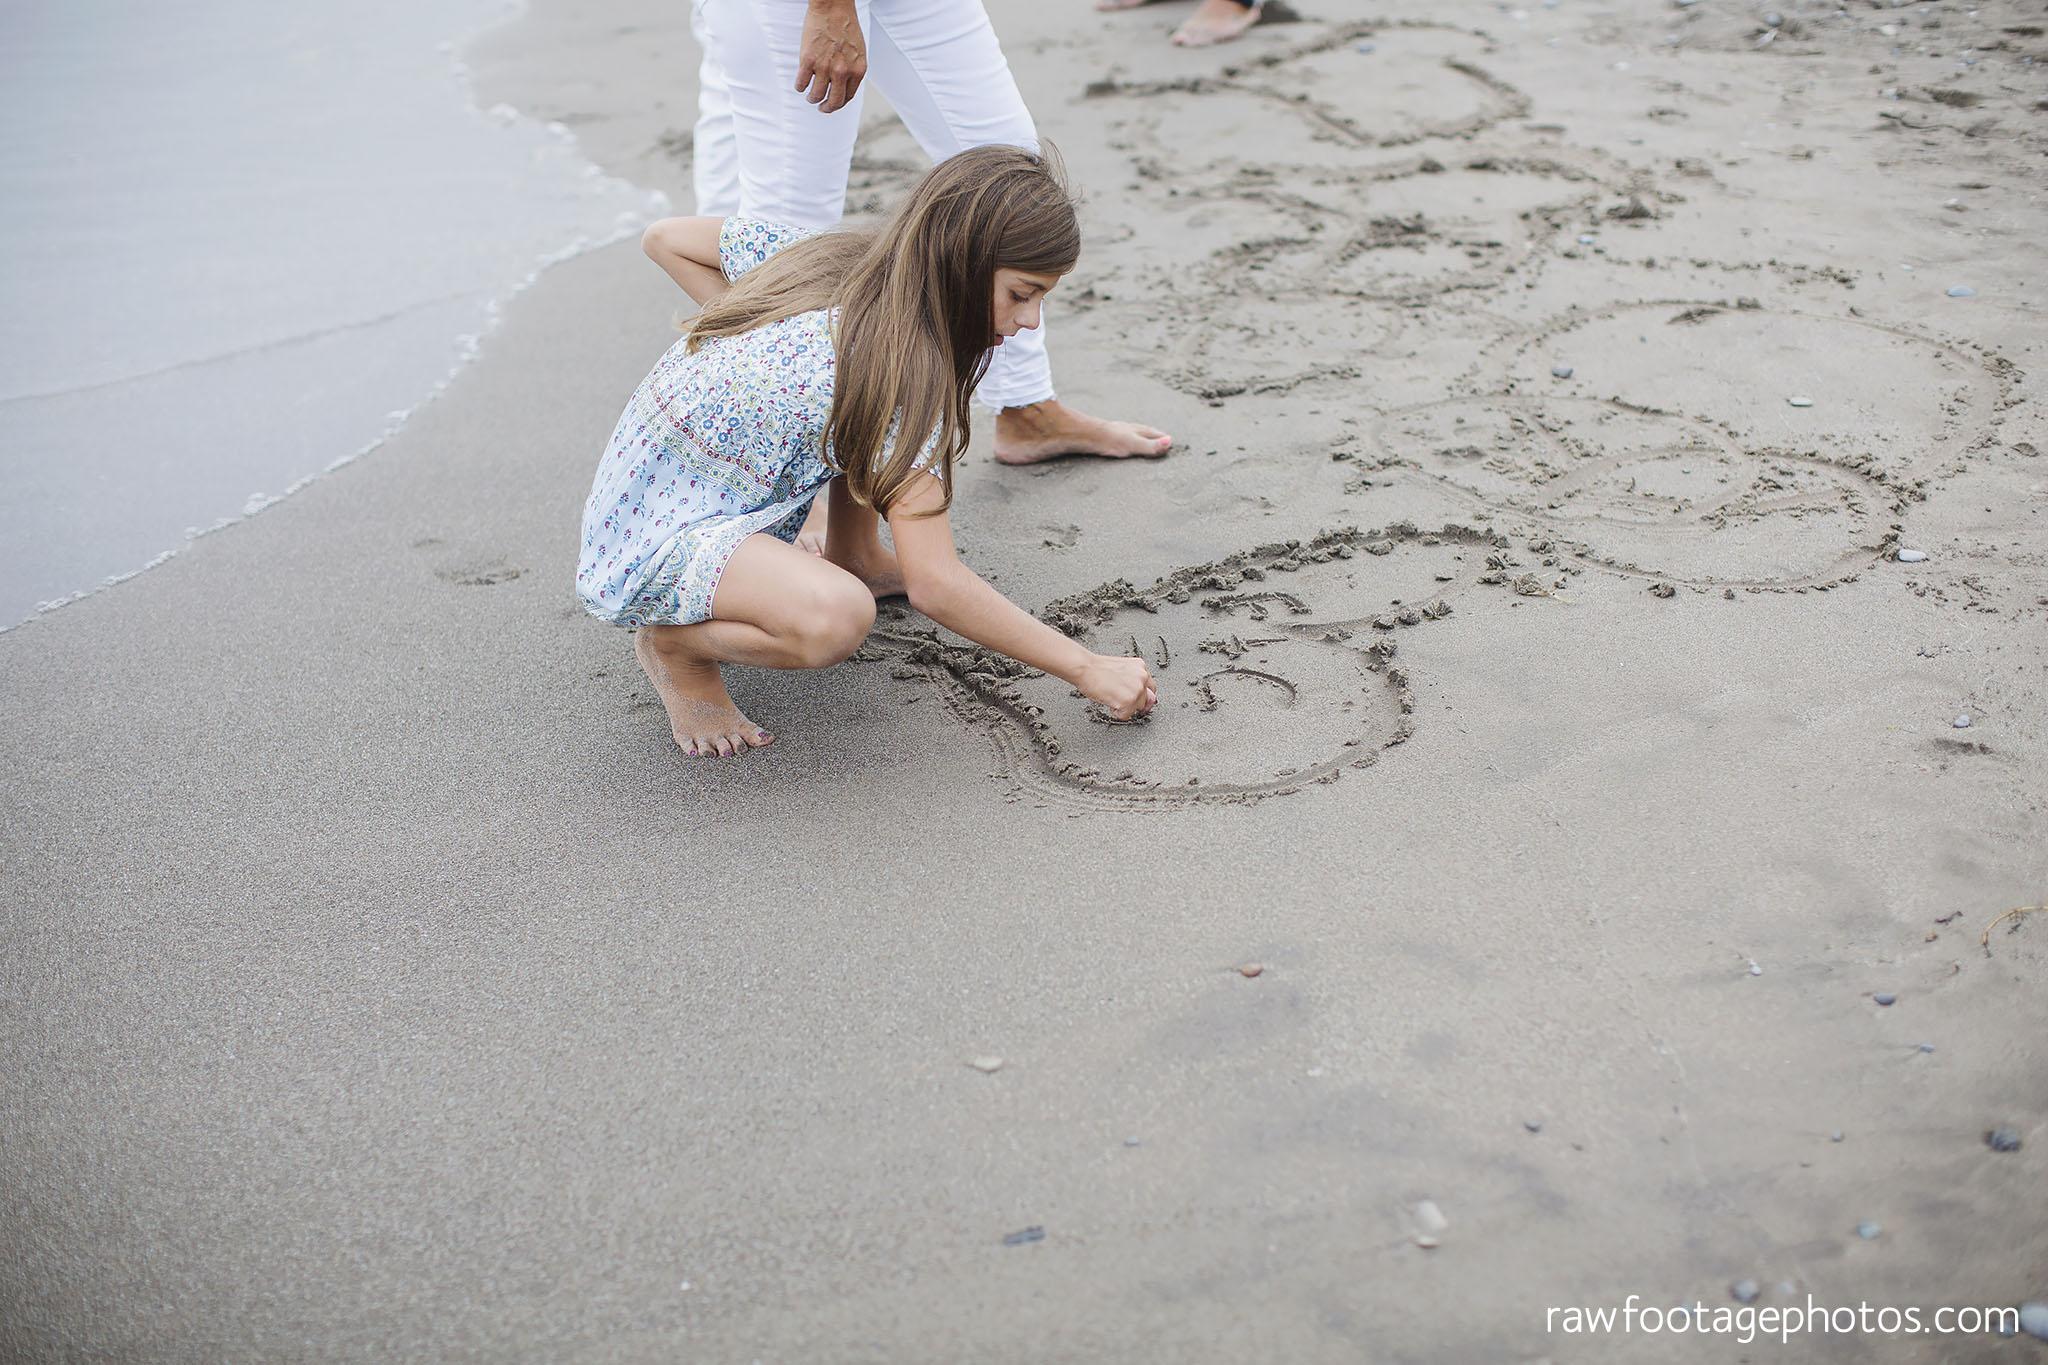 London_ontario_family_photographer_beach_photos038_1.jpg